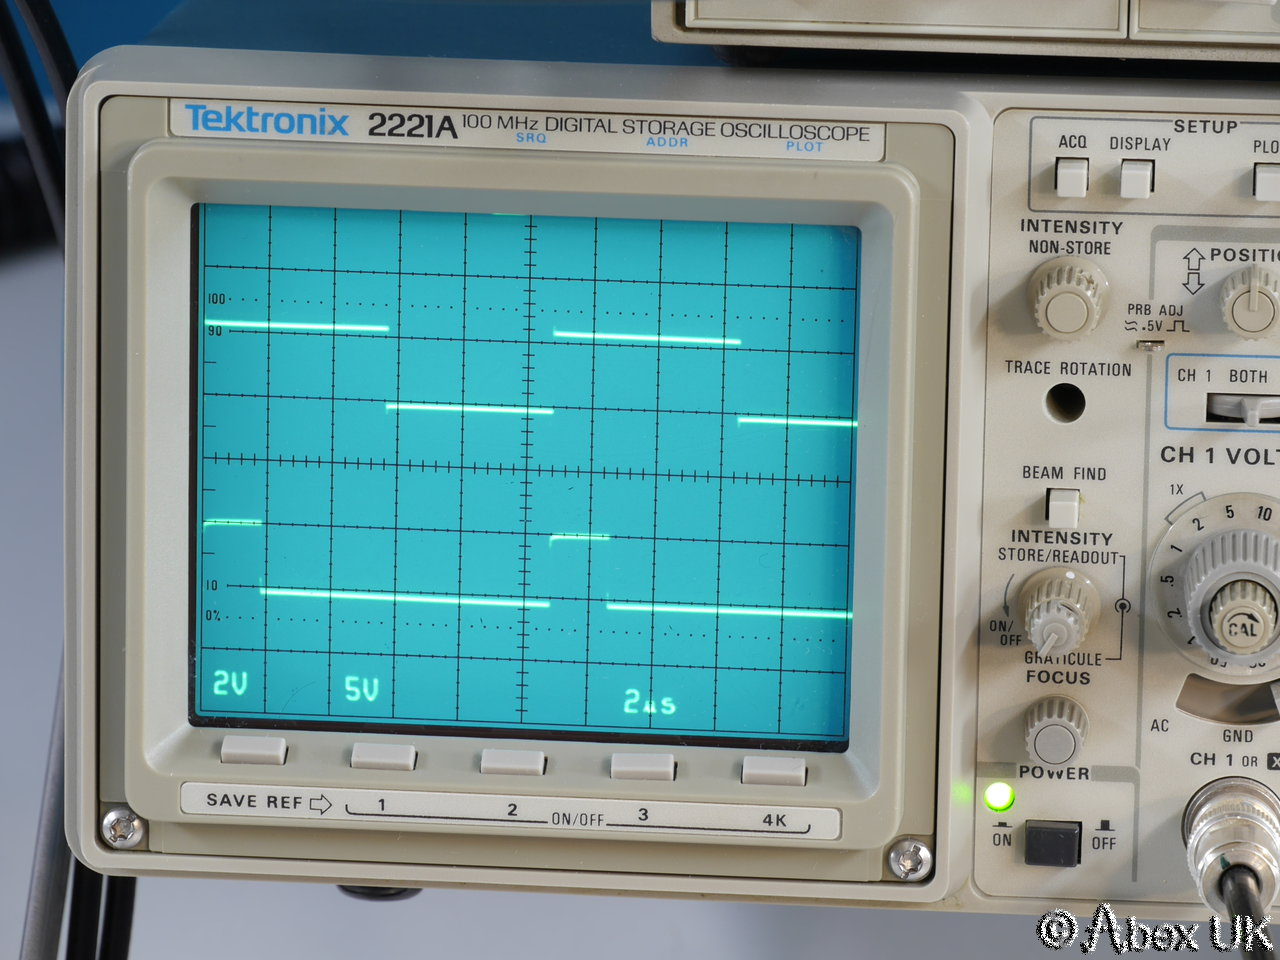 Best Tektronix Oscilloscope : Tektronix a mhz analogue digital oscilloscope